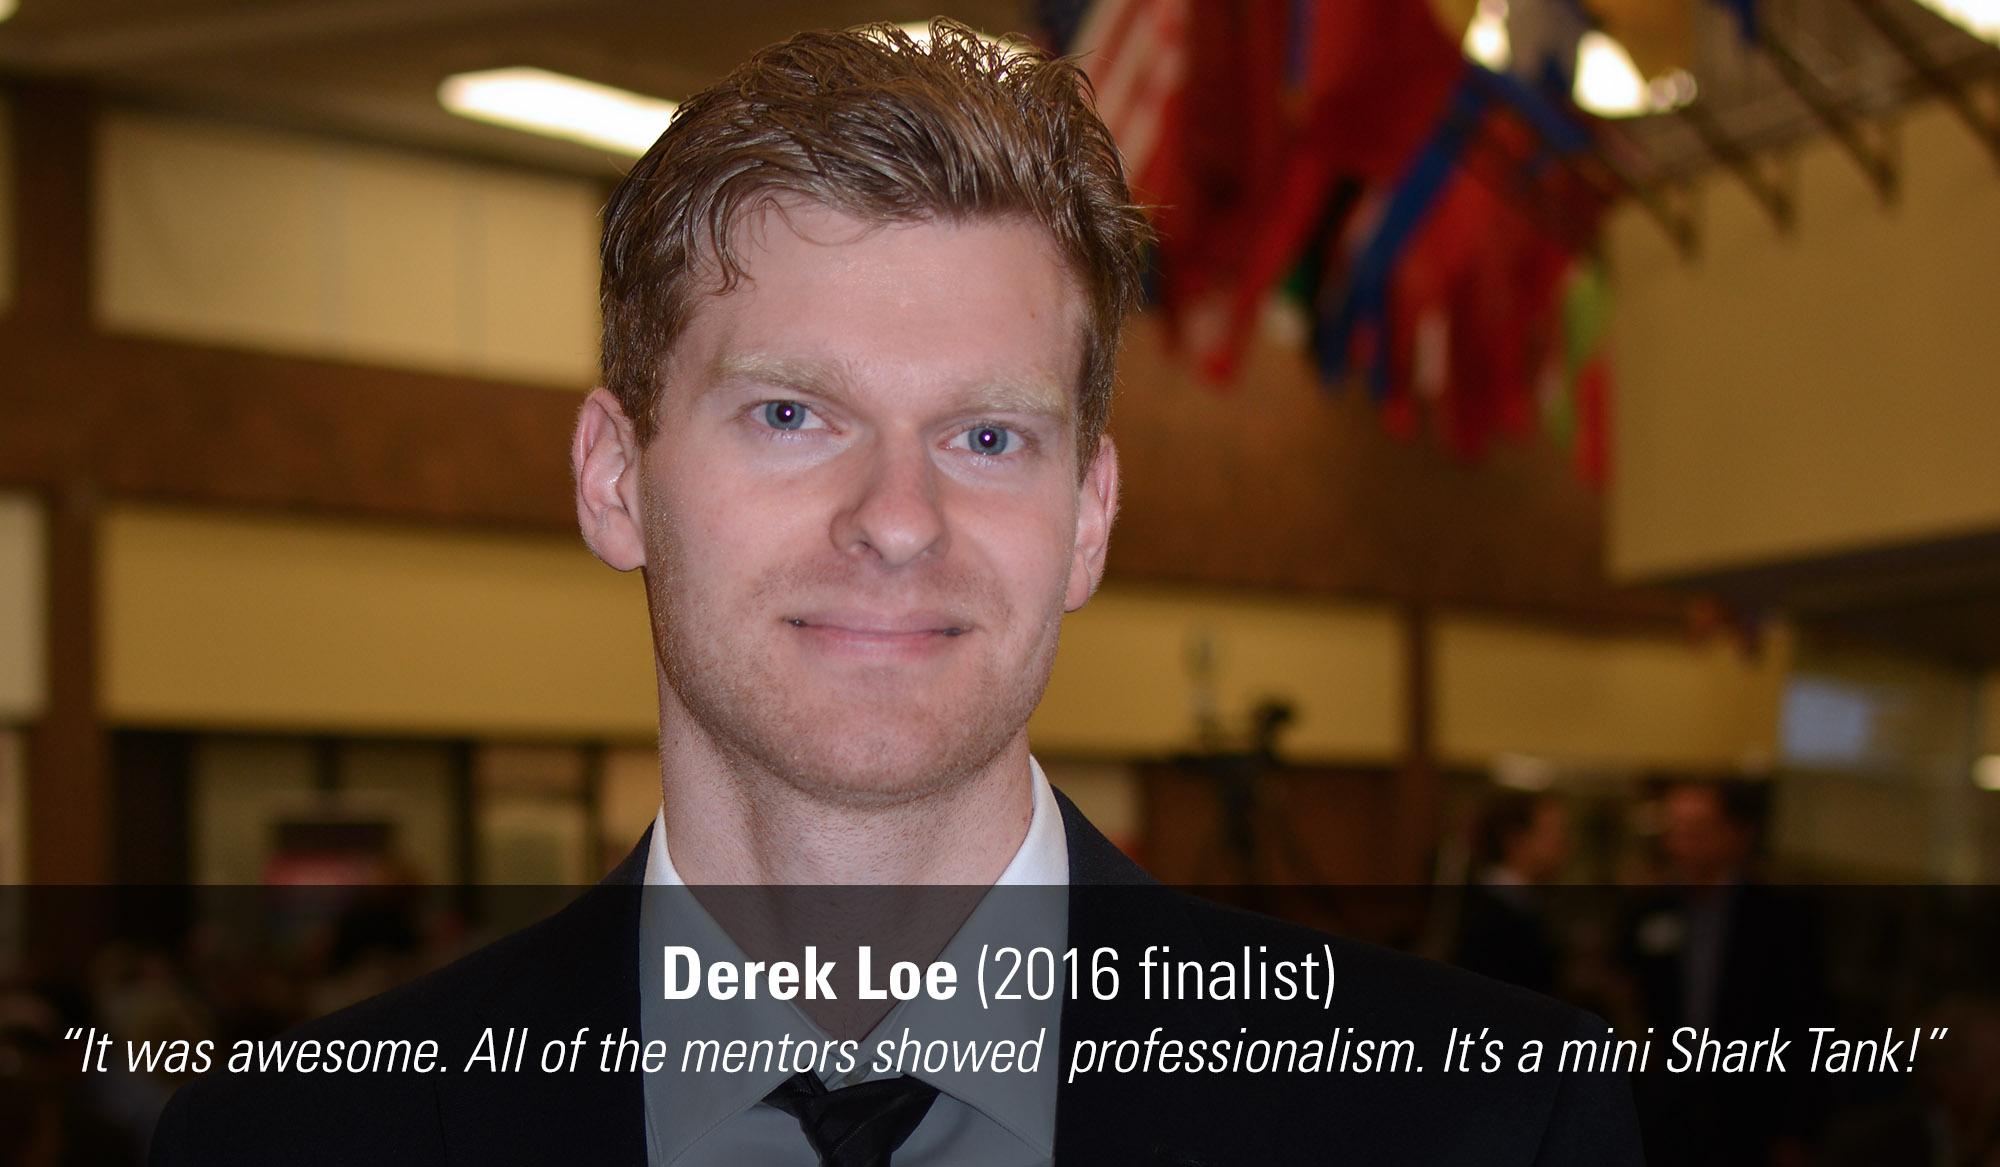 Derek Loe